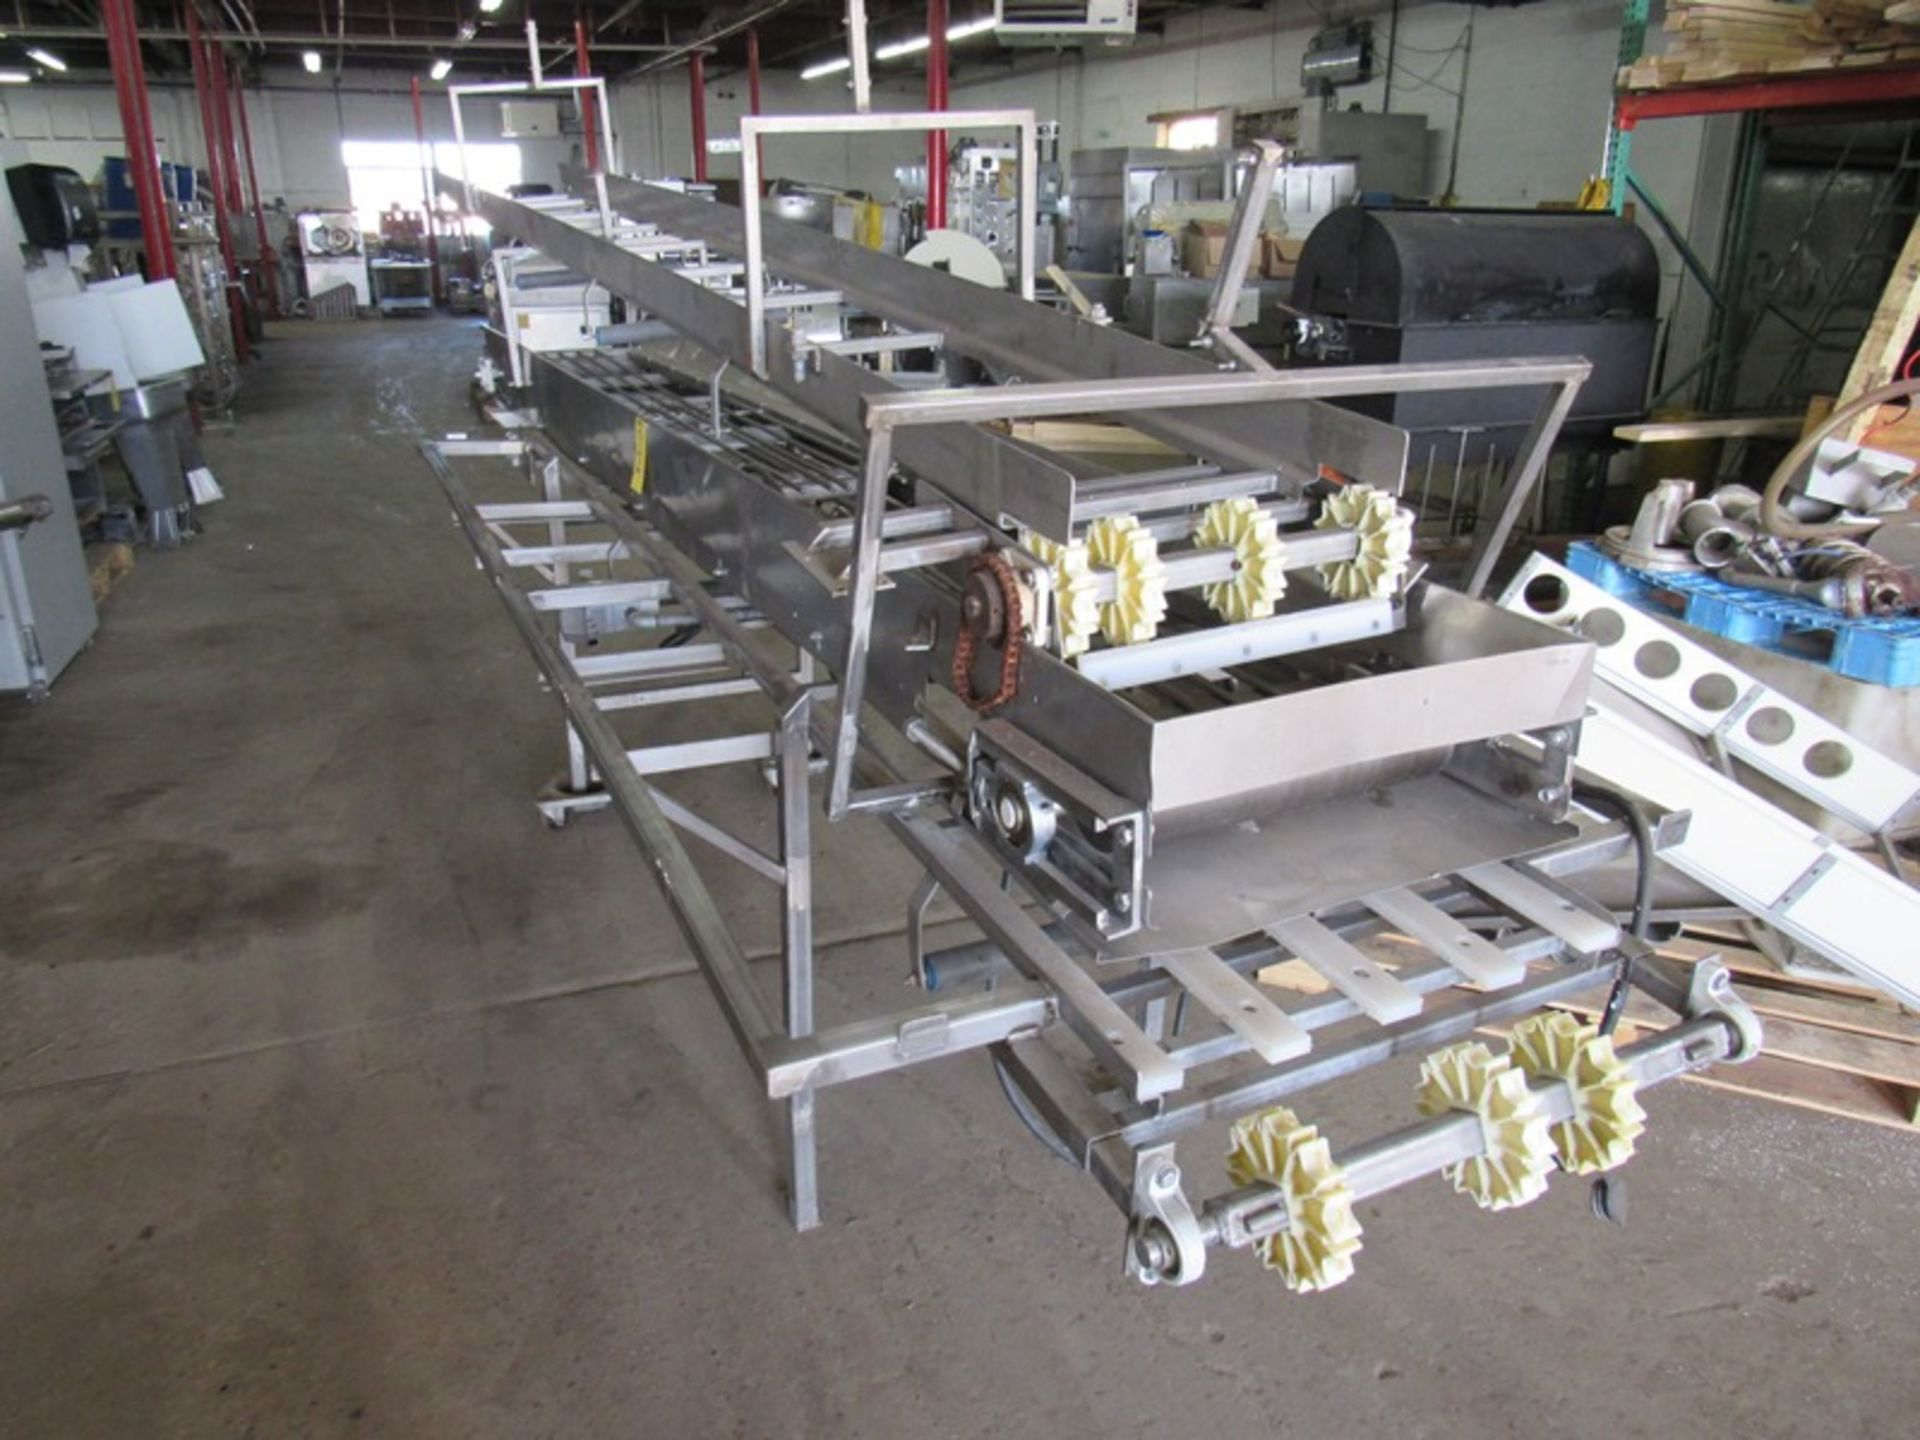 "Lot 2 - Stainless Steel Boning Table/Conveyor, 18"" W X 15' L w/ceiling mounted takeaway conveyor, missing"